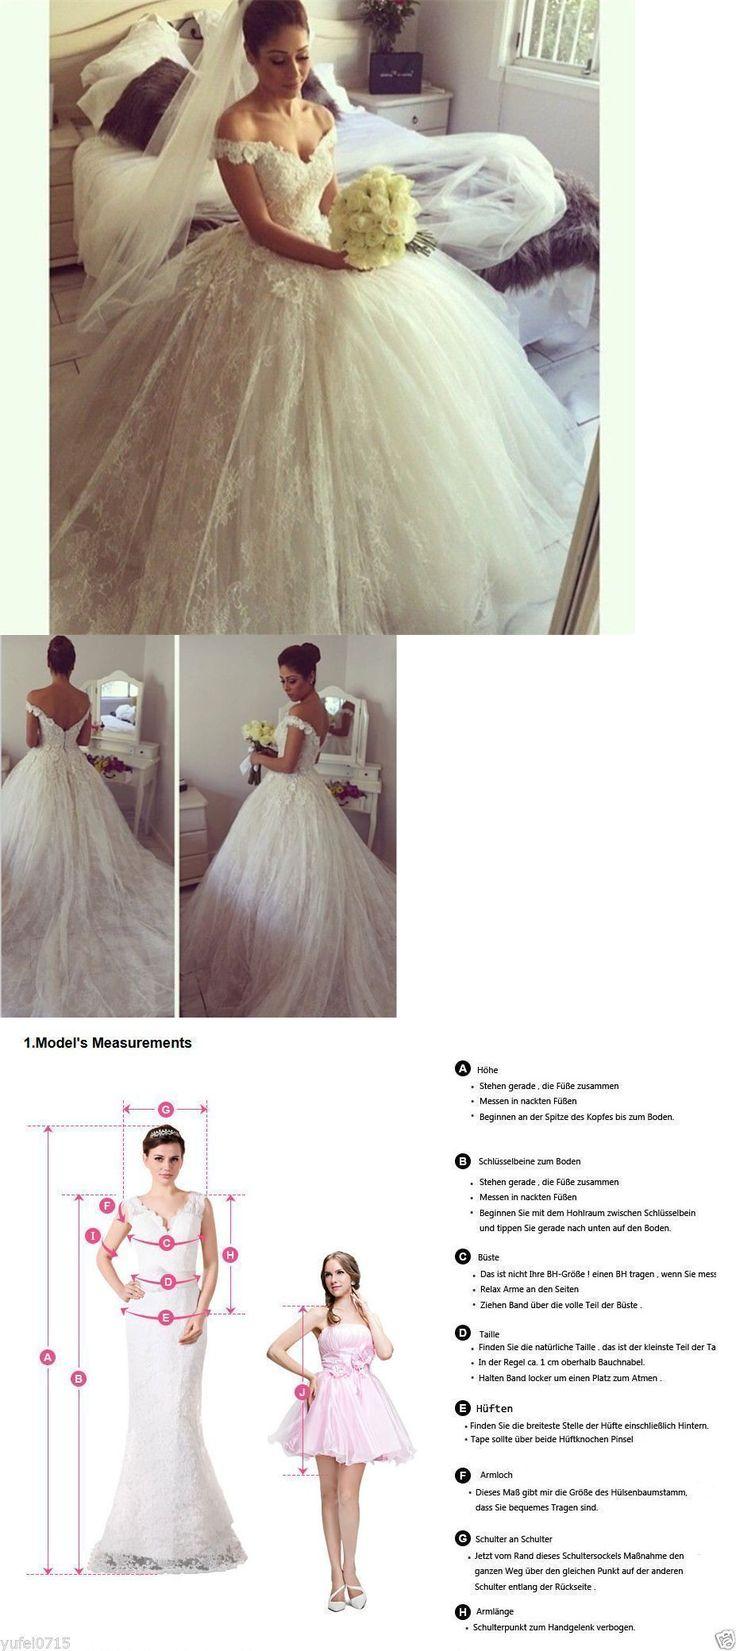 Wedding Dresses: New Bridal Gown White Ivory Wedding Dress Custom Size 4-6-8-10-12-14-16-18+ -> BUY IT NOW ONLY: $155 on eBay!